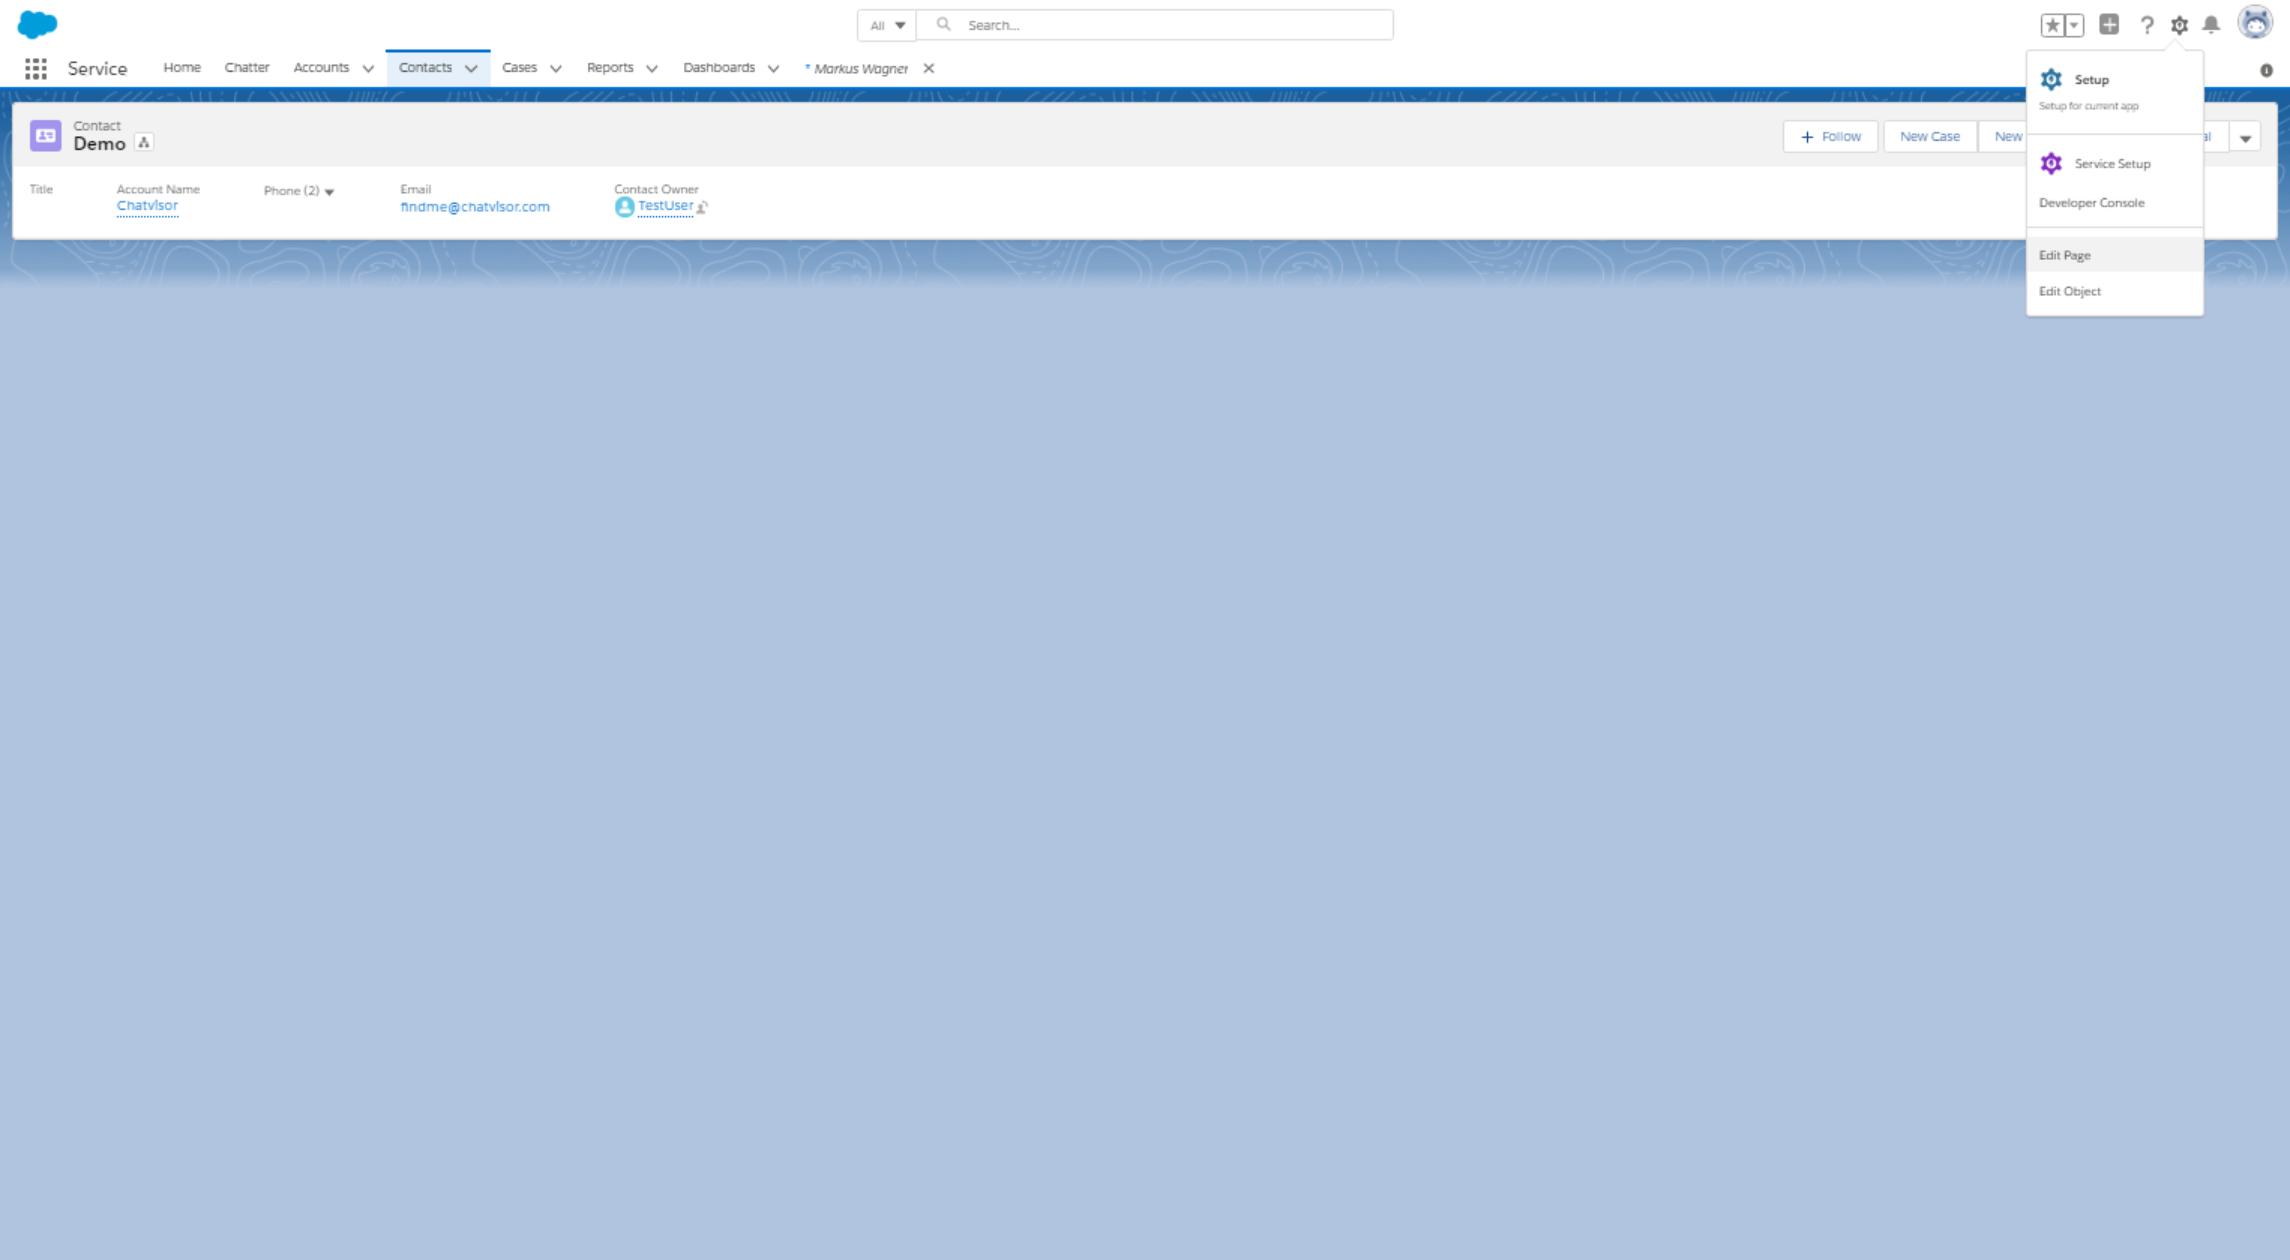 Edit a page in Salesforce